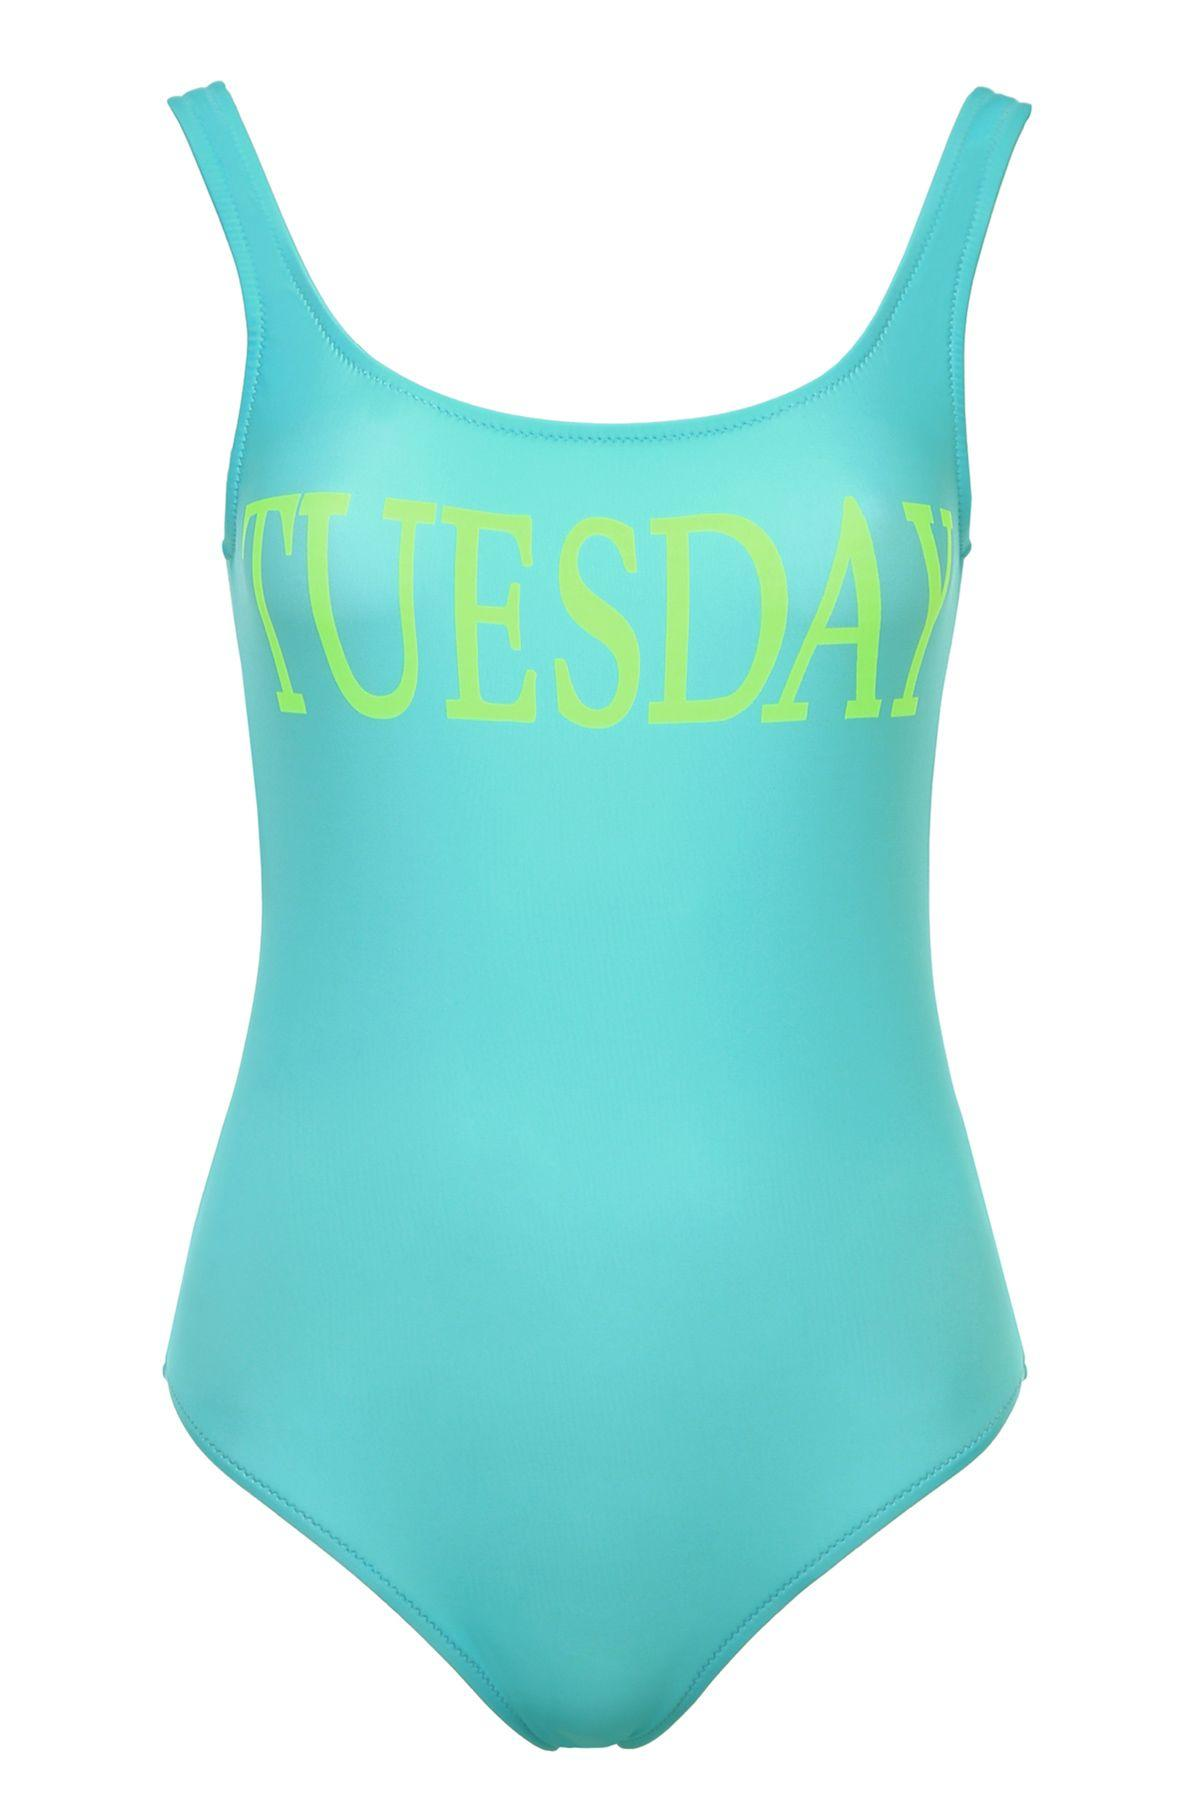 48c2557c5f Alberta Ferretti Swimsuit One-Piece Swimsuit With Tuesday Rainbow Week  Print In Blue